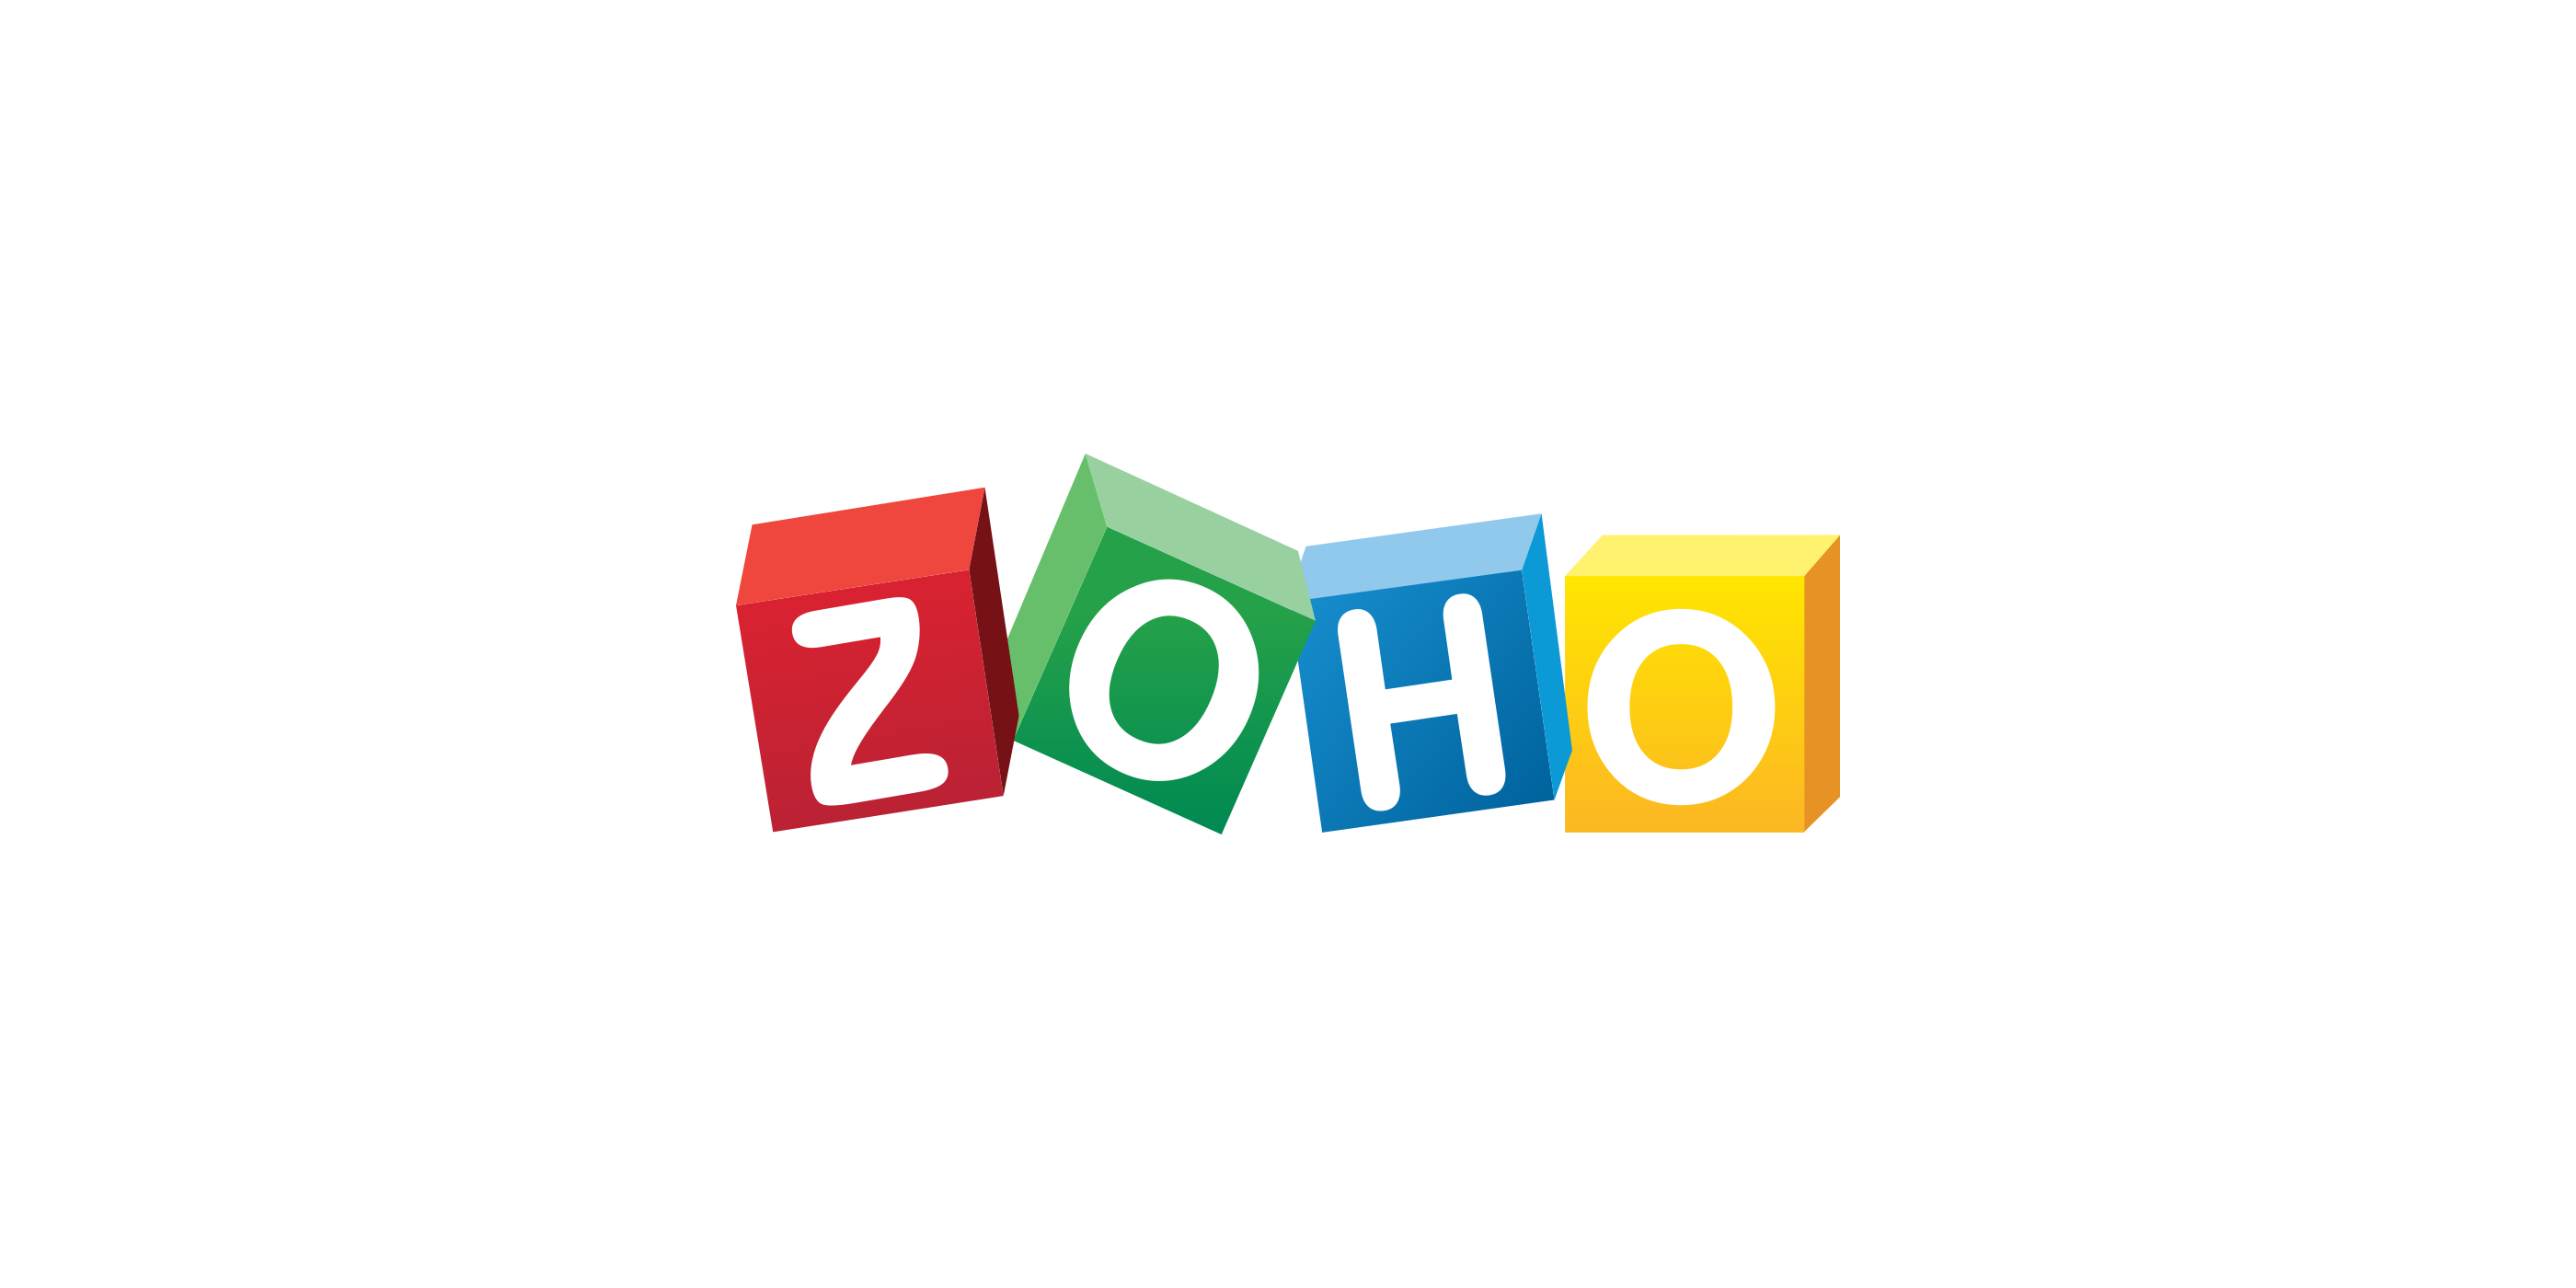 Zoho Suite